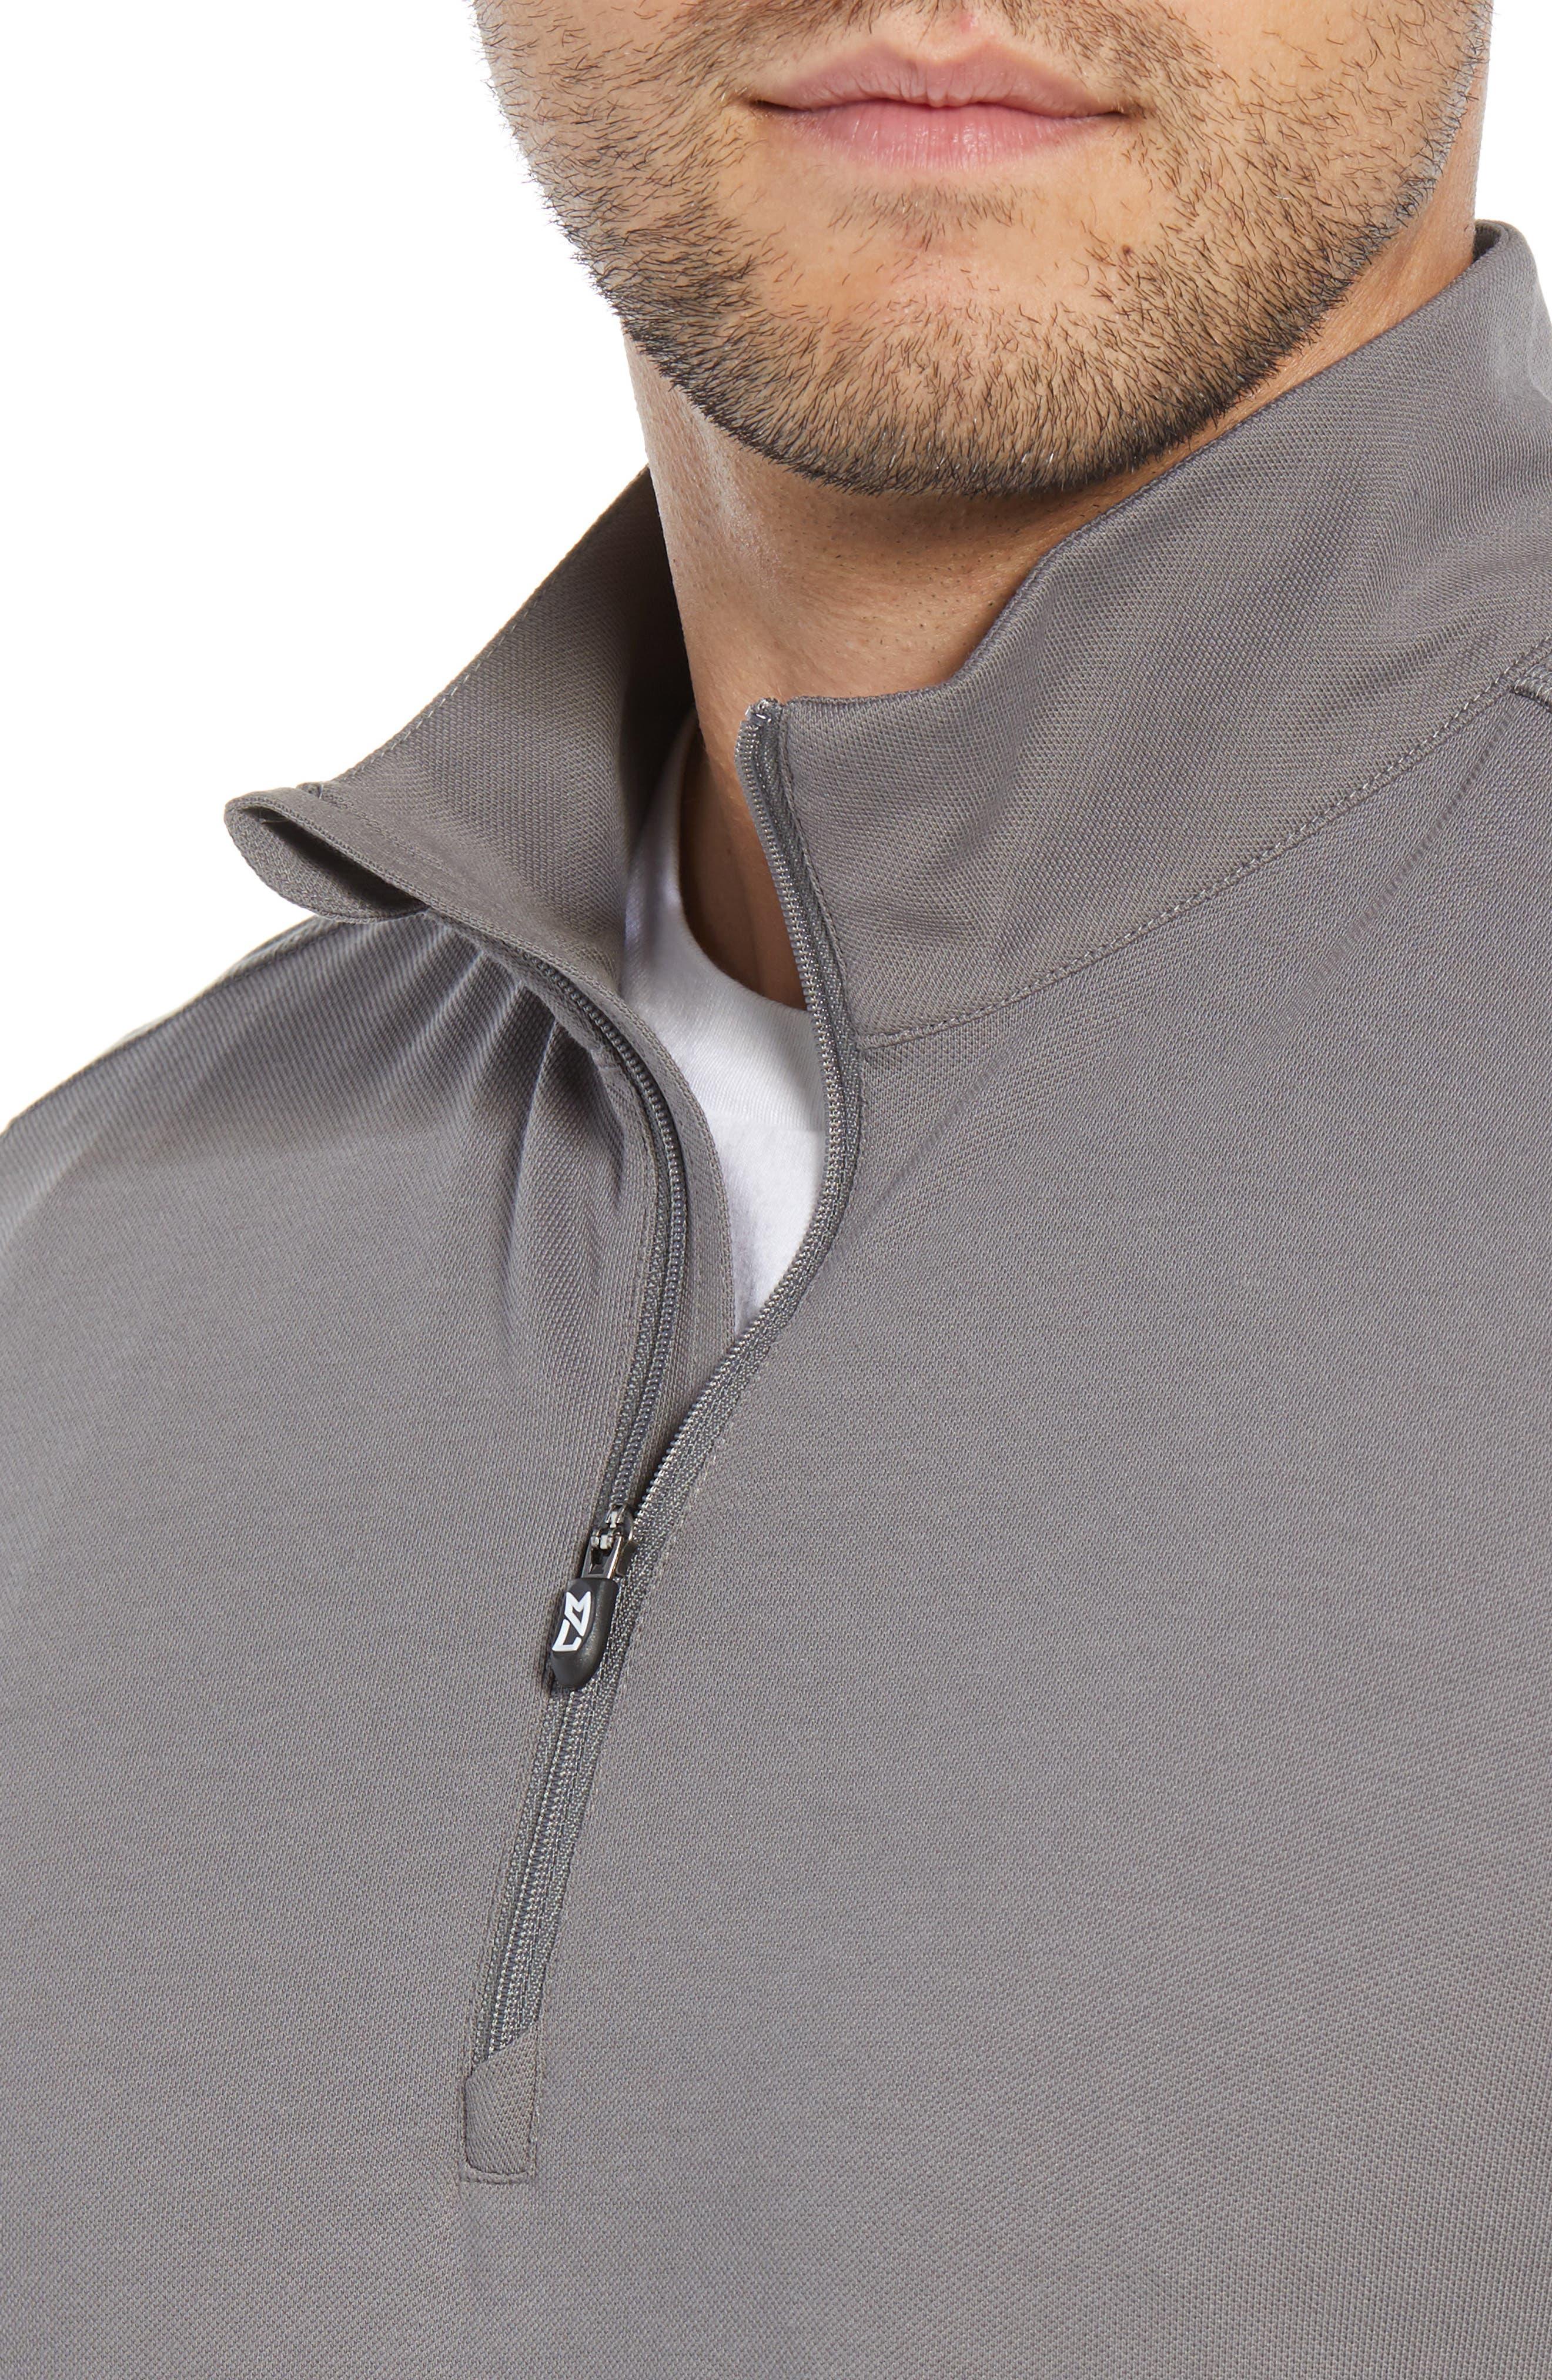 CUTTER & BUCK, Advantage Regular Fit DryTec Mock Neck Pullover, Alternate thumbnail 4, color, ELEMENTAL GREY